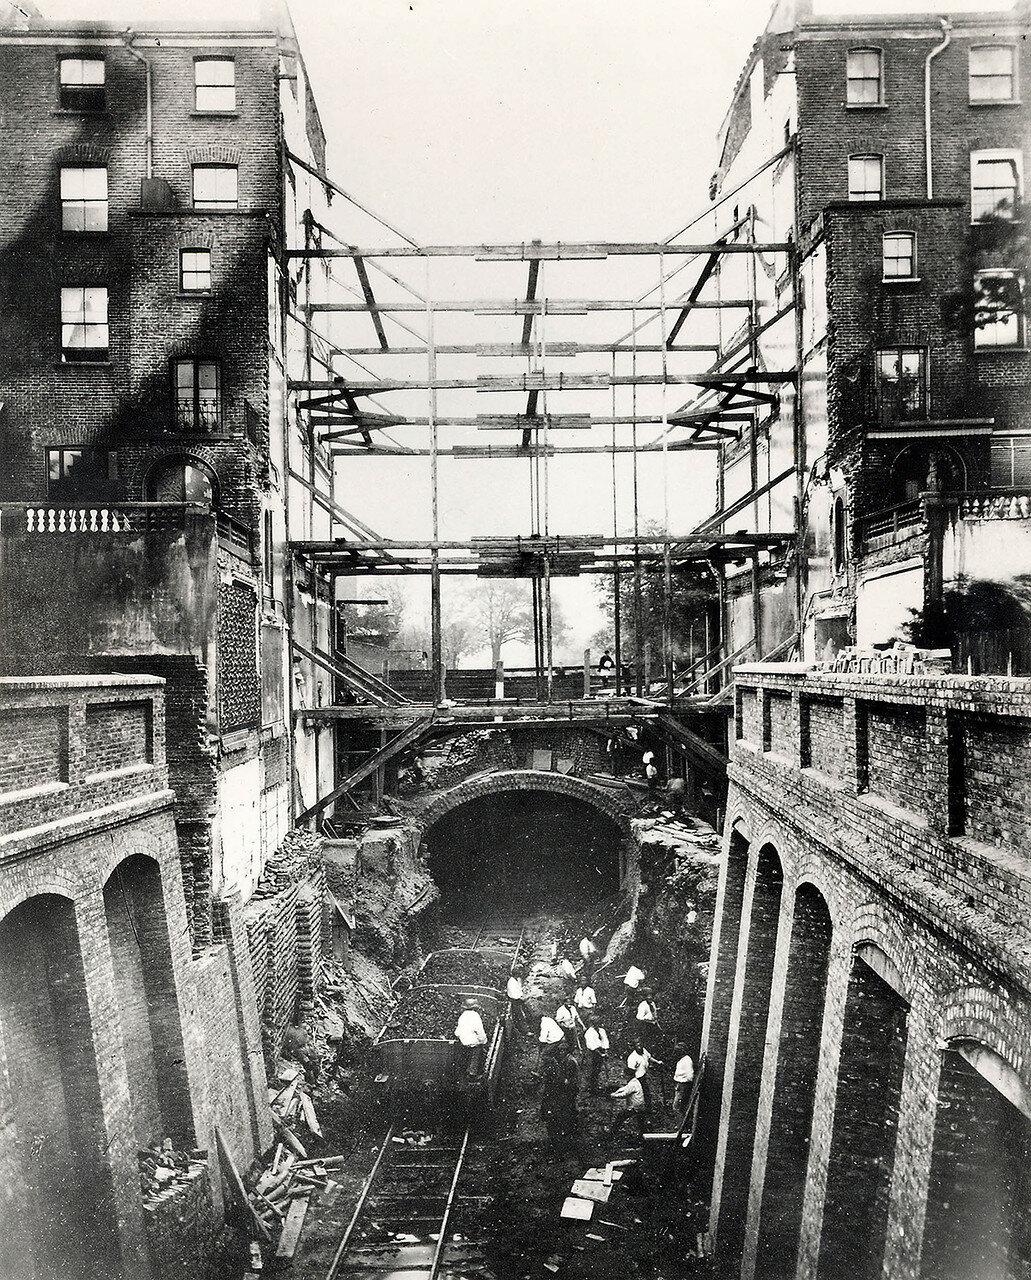 1923. Разрушение садов Лейнстера при прокладке линии метро